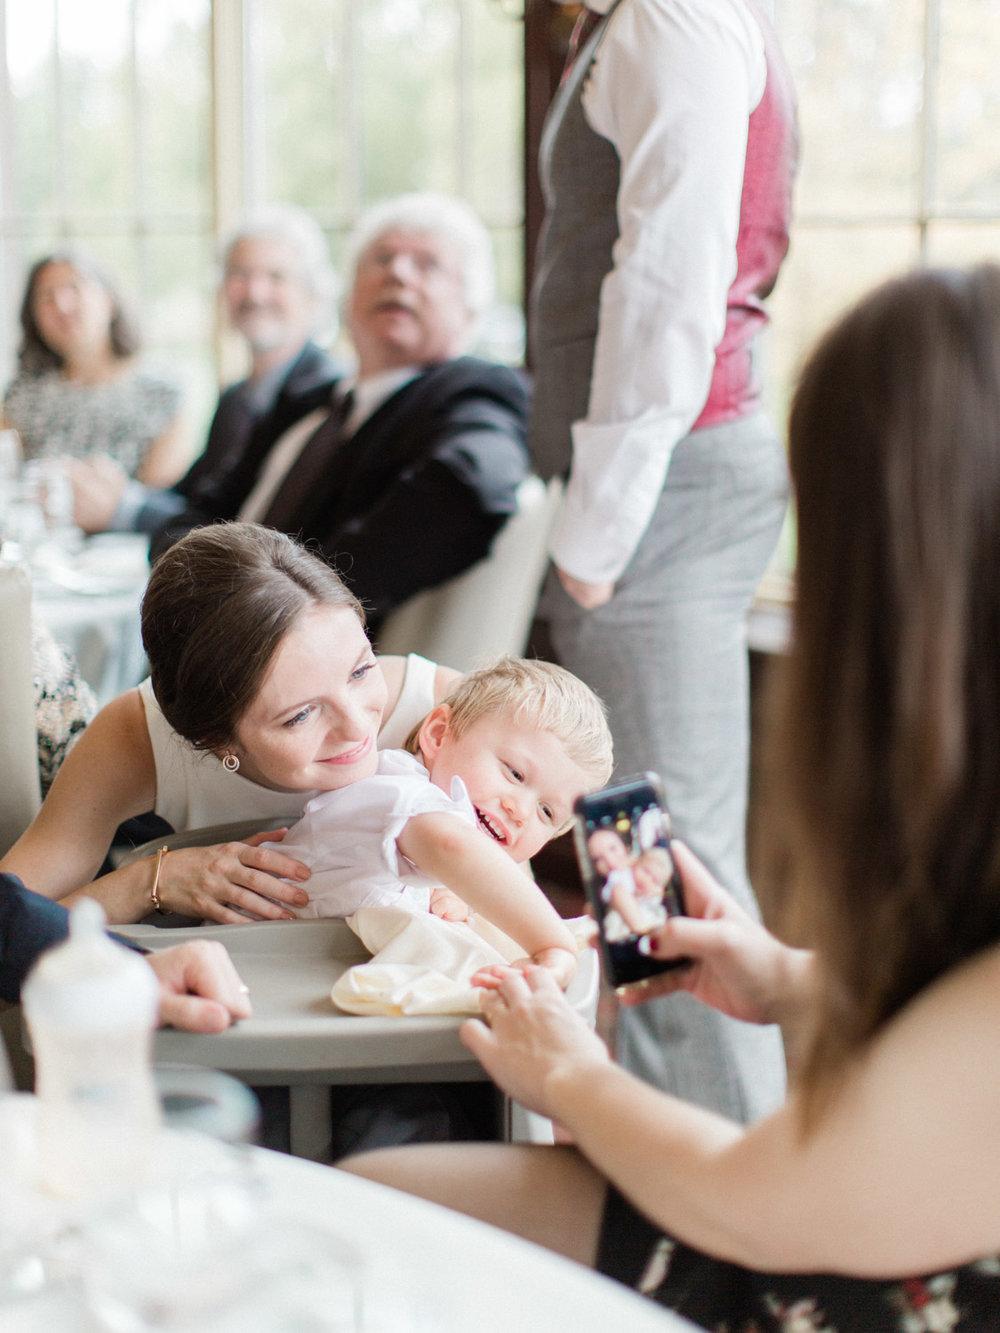 Toronto-wedding-photographer-st-georges-golf-club-jewish-modern-fall83.jpg